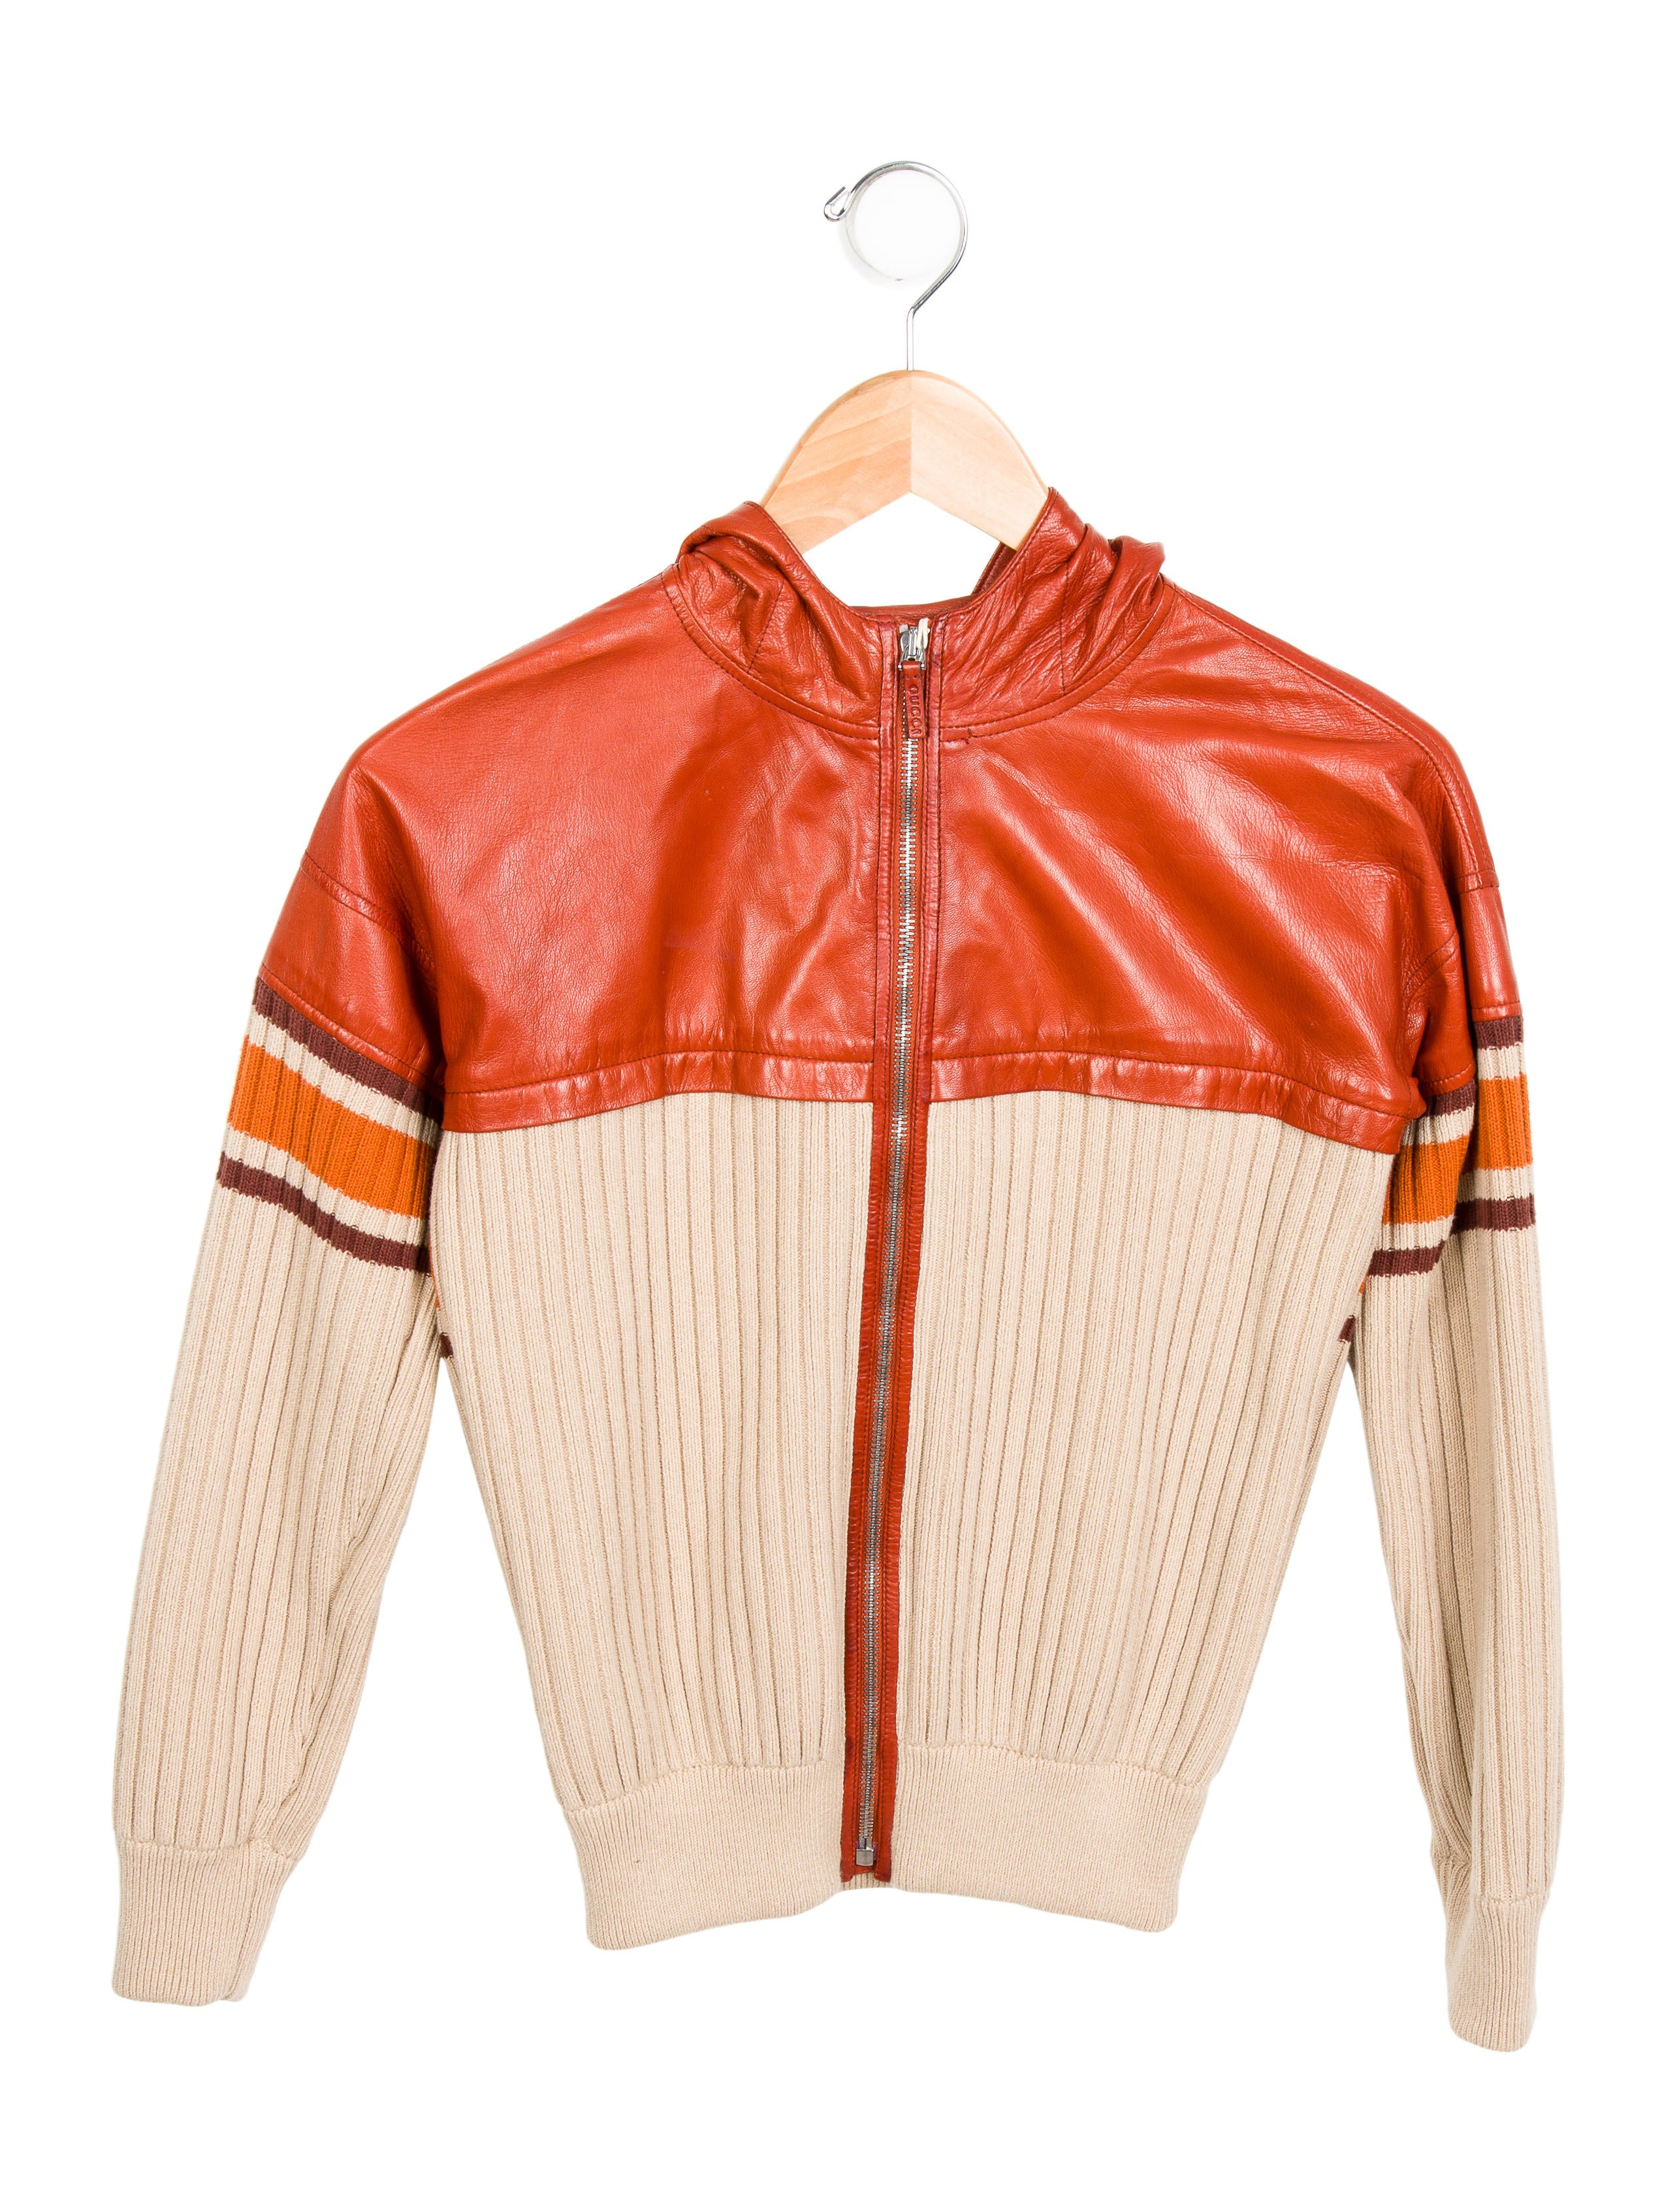 Knitting Jacket For Boy : Gucci boys leather paneled knit jacket guc